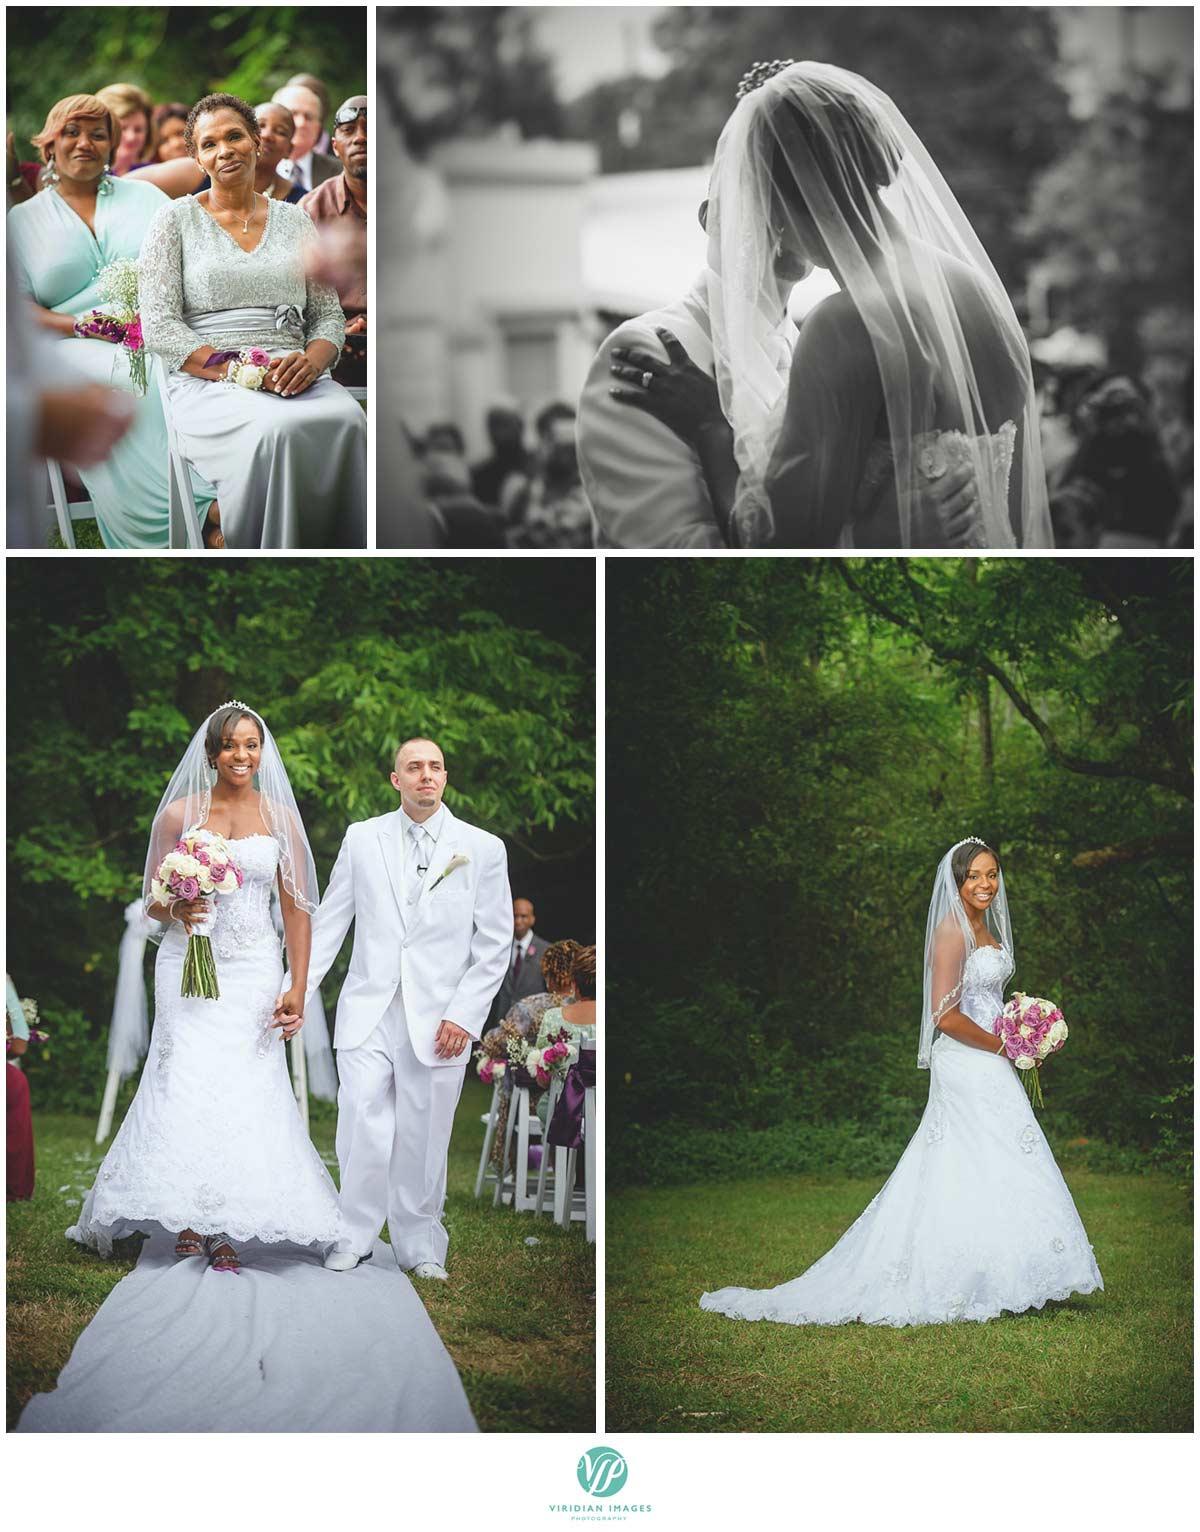 Atlanta-wedding-photographers-ceremony-kiss-aisle-bride-portrait-interracial-photo-11